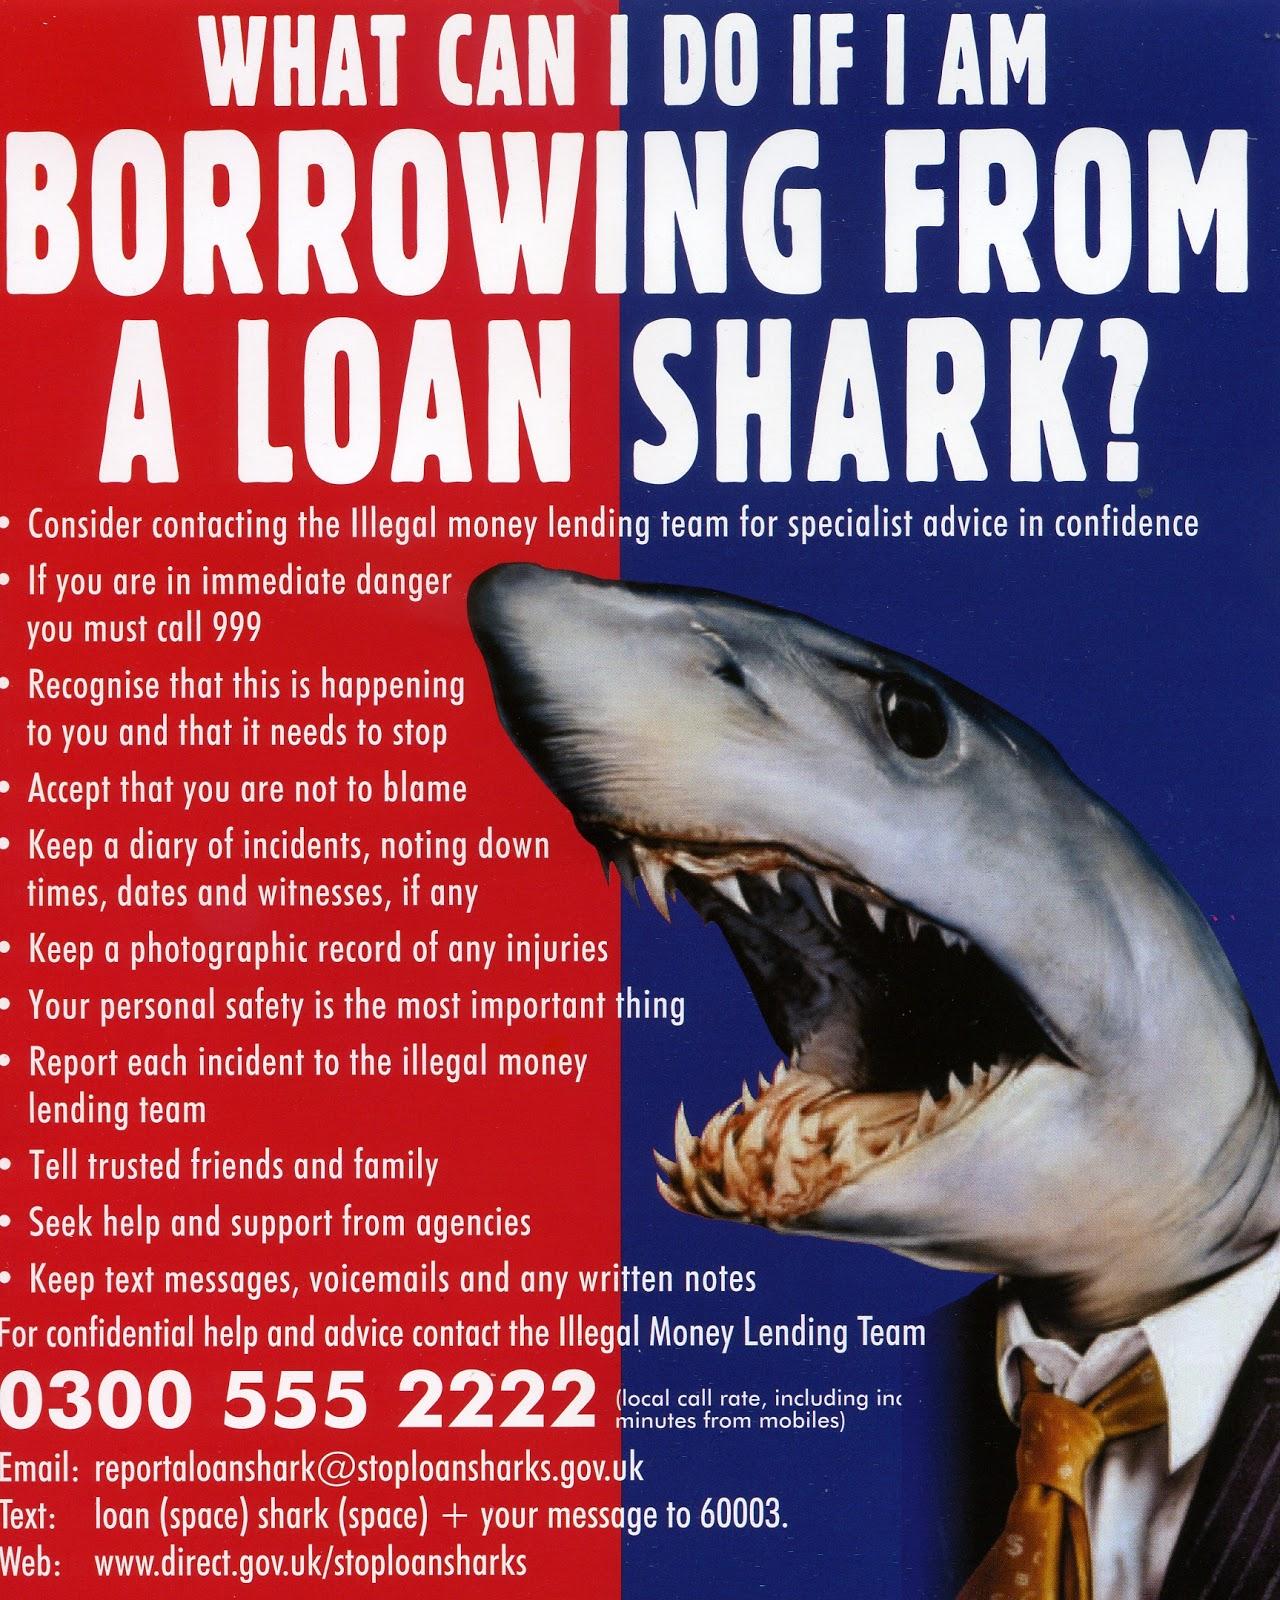 Neighbourhood Management: What can you do if borrowing from a loan shark?